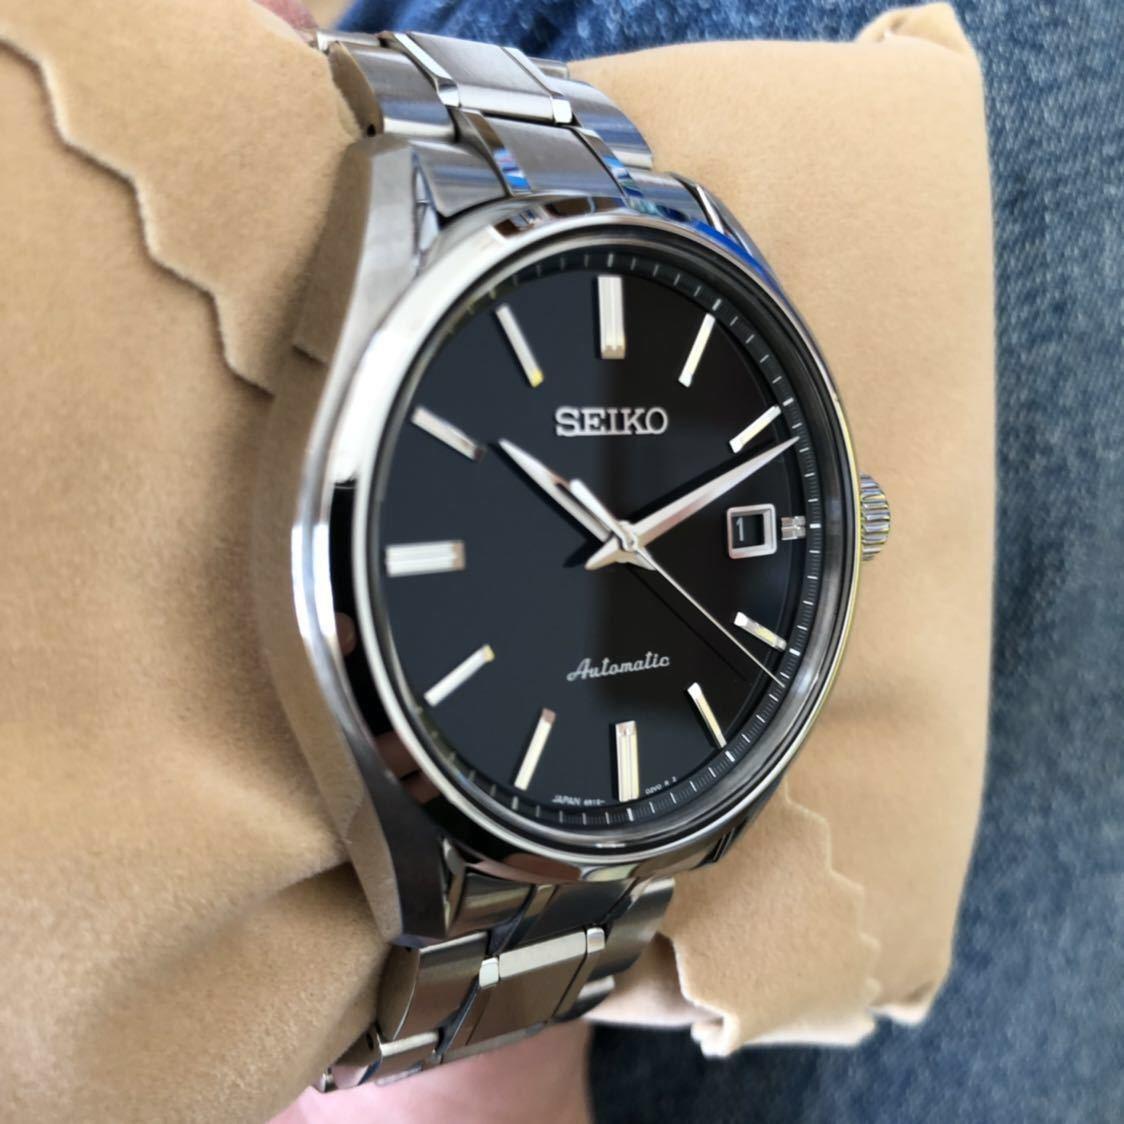 SEIKO PRESAGE SARX035 セイコー プレザージュ 機械式 メカニカル 腕時計 自動巻_画像4